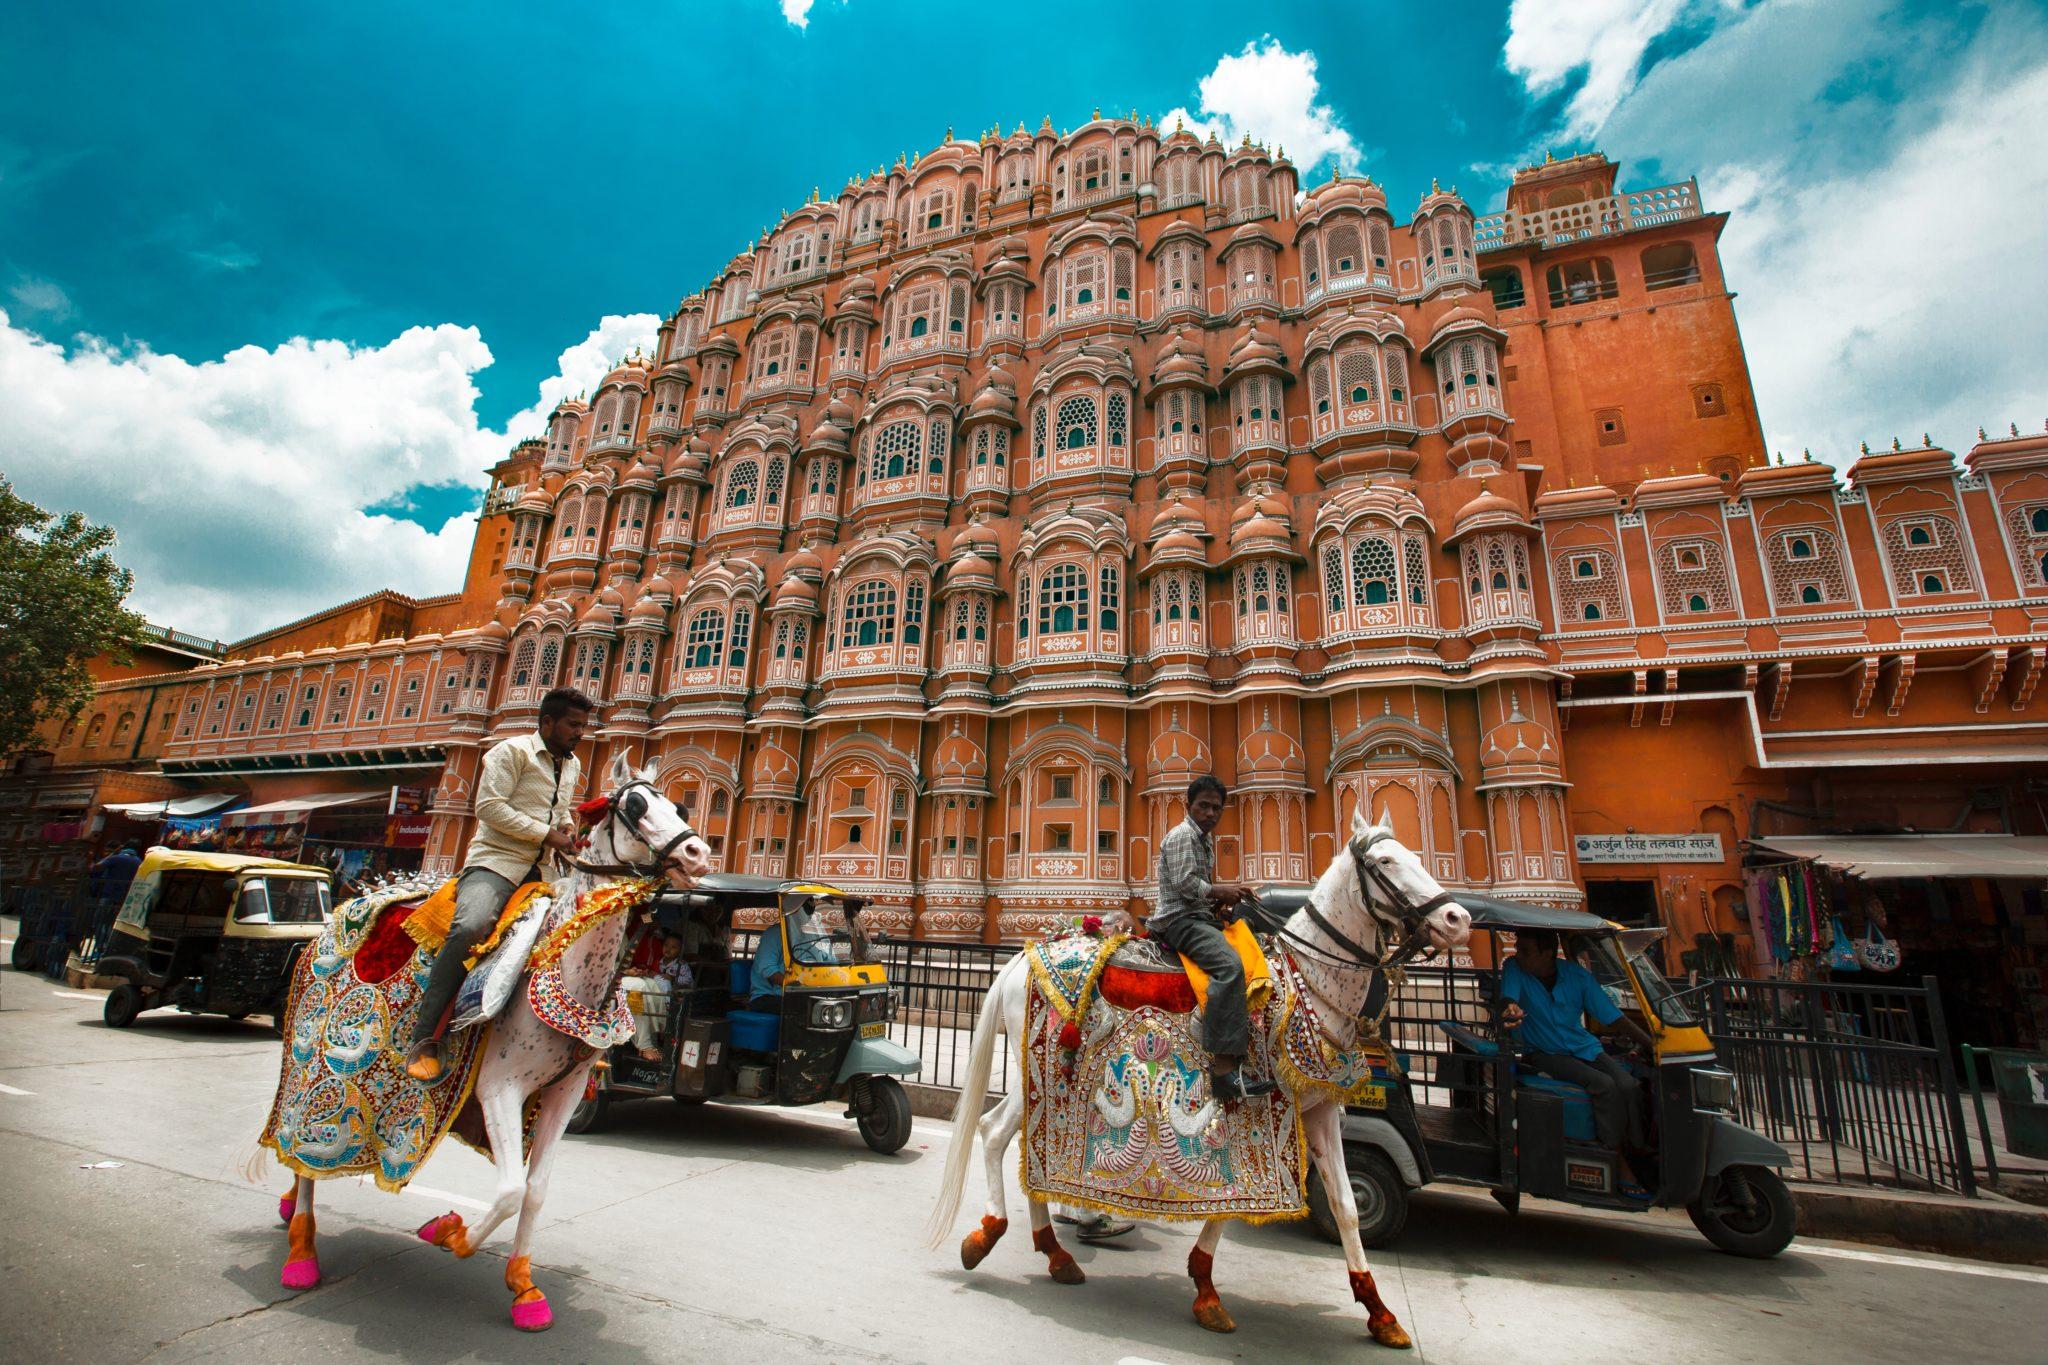 Golden Triangle Tour 2020 - Delhi Agra Jaipur